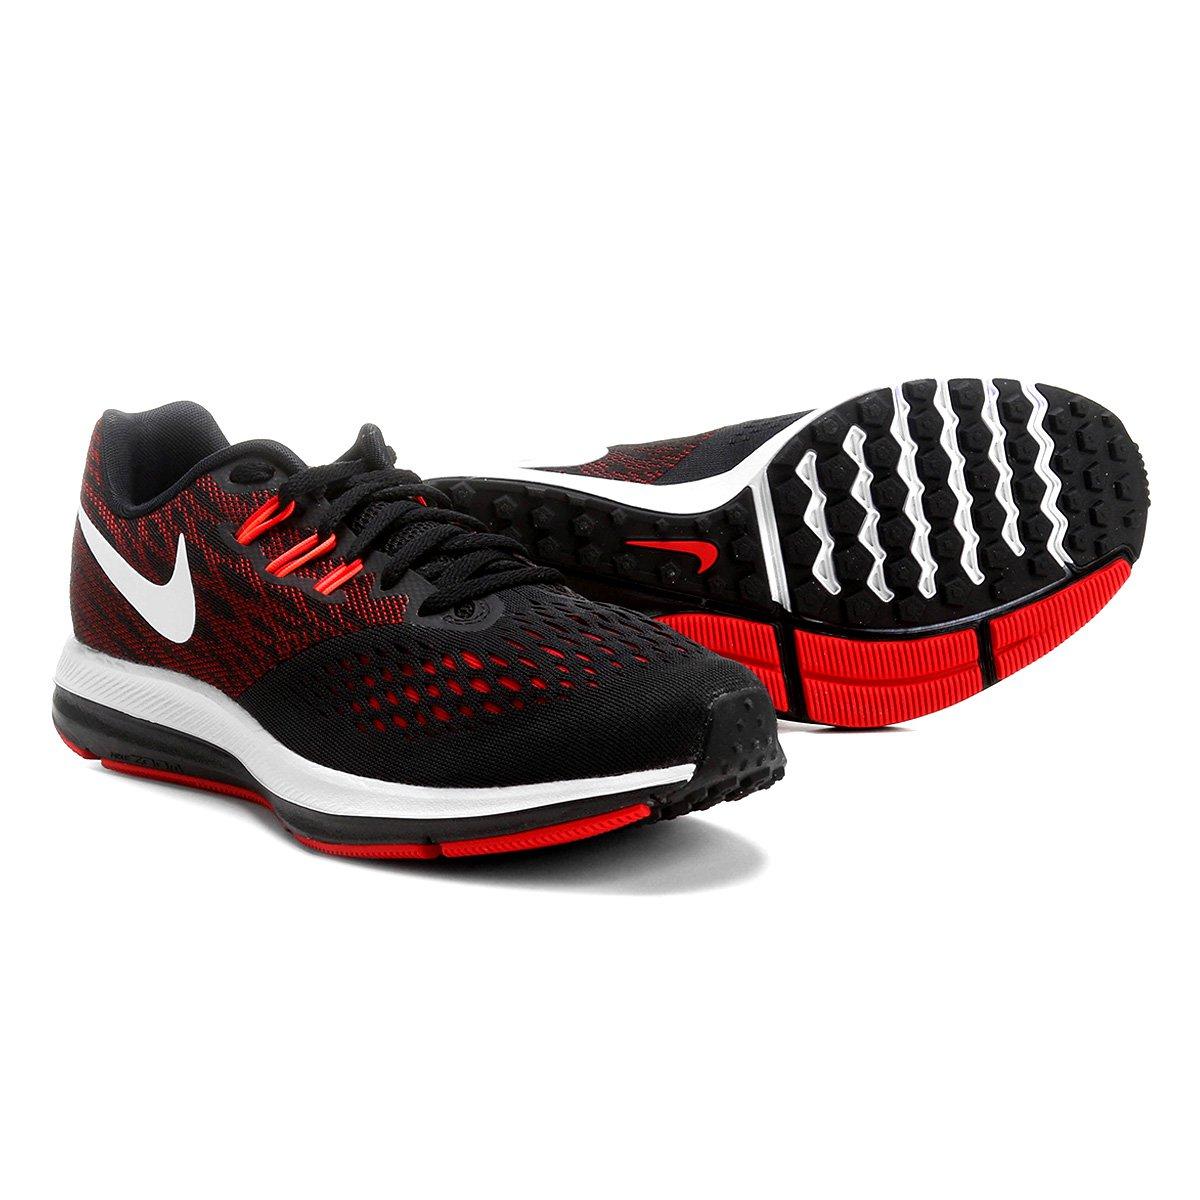 14fe12d59 Tênis Nike Zoom Winflo 4 Masculino - Compre Agora